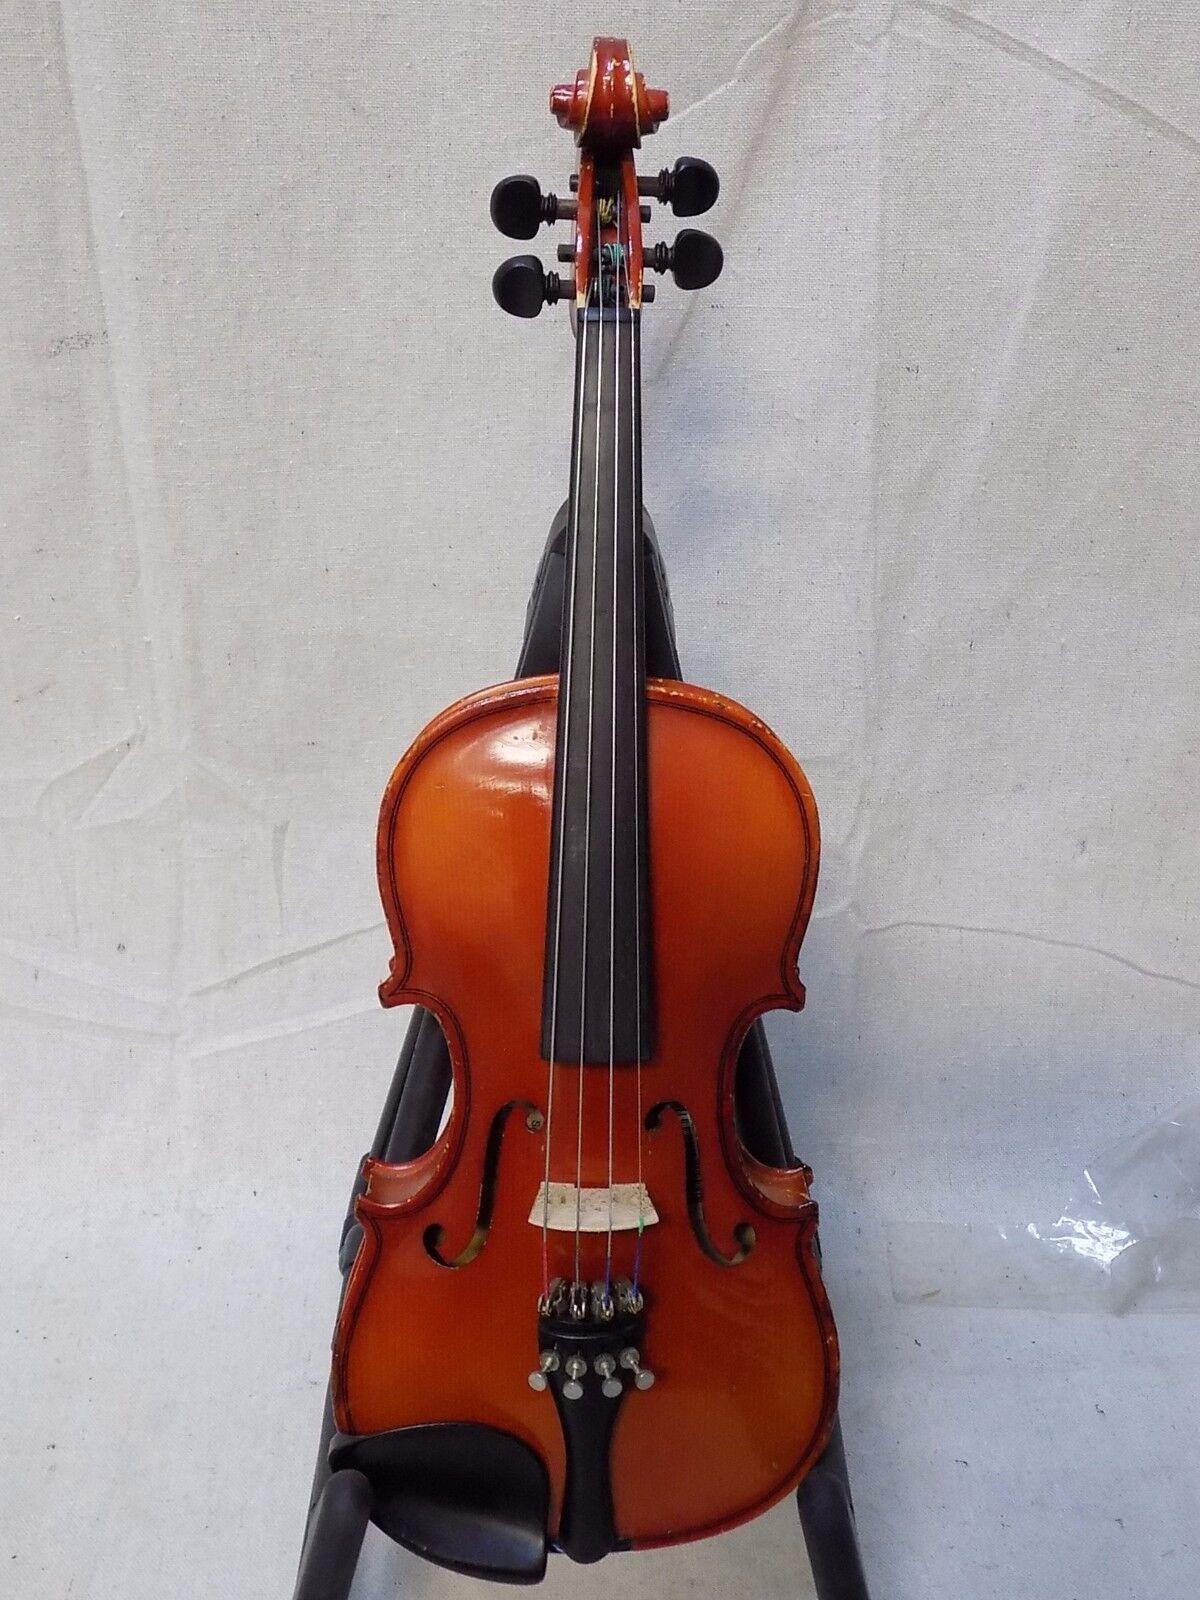 Refurbished Scherl & Roth 1/4 Größe Student Violin Outfit